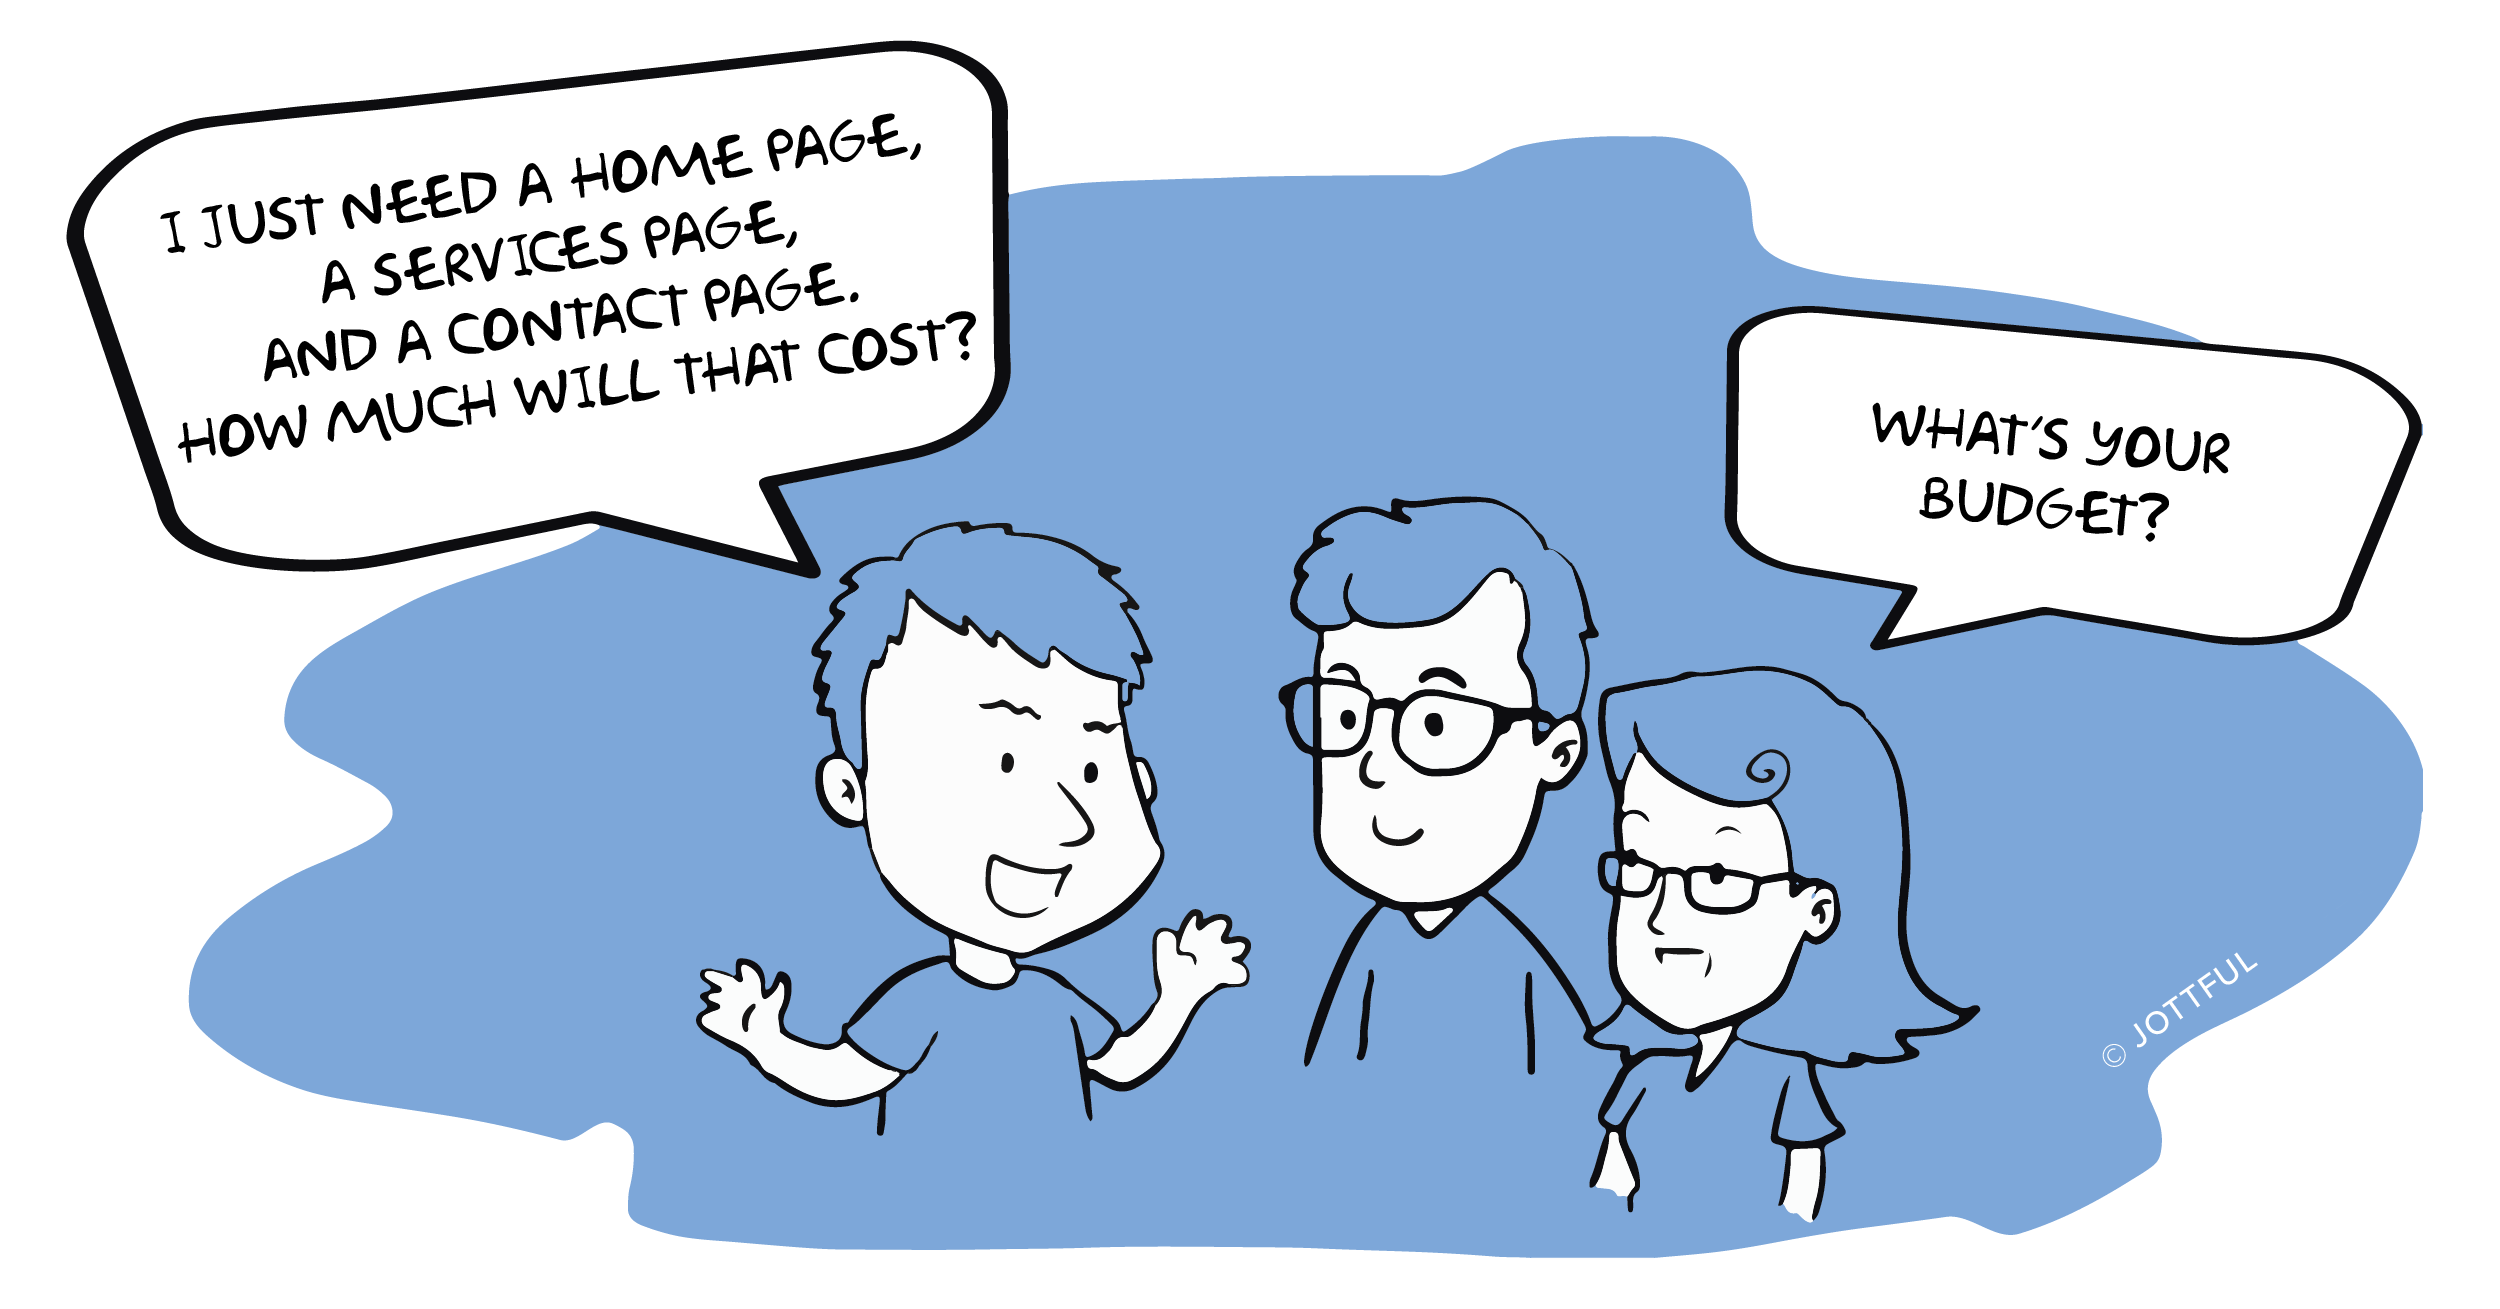 cartoon about website budgets